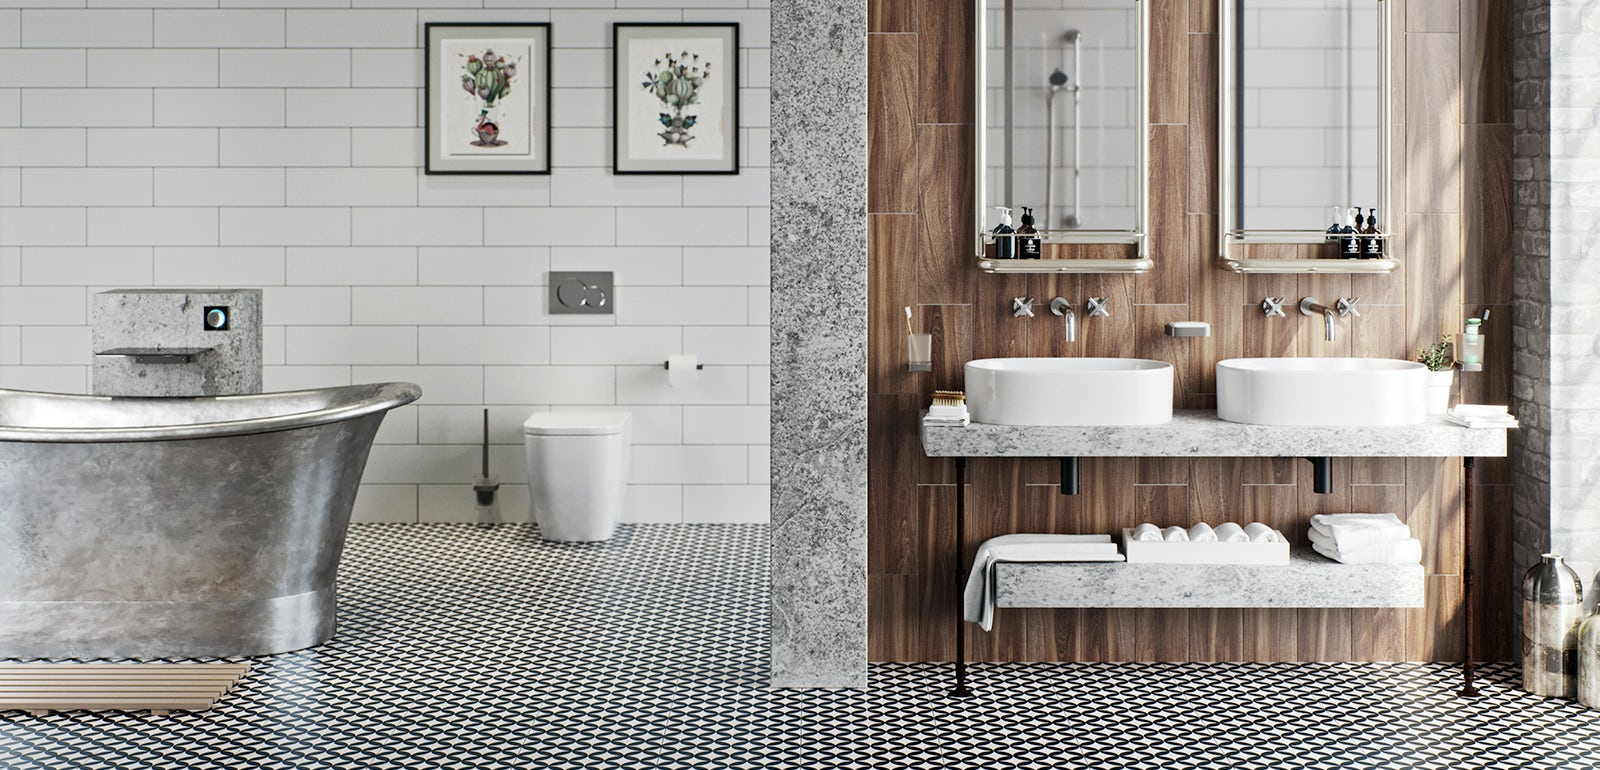 bathroom ideas soft industrial bathrooms victoriaplumcom - Industrial Bathroom